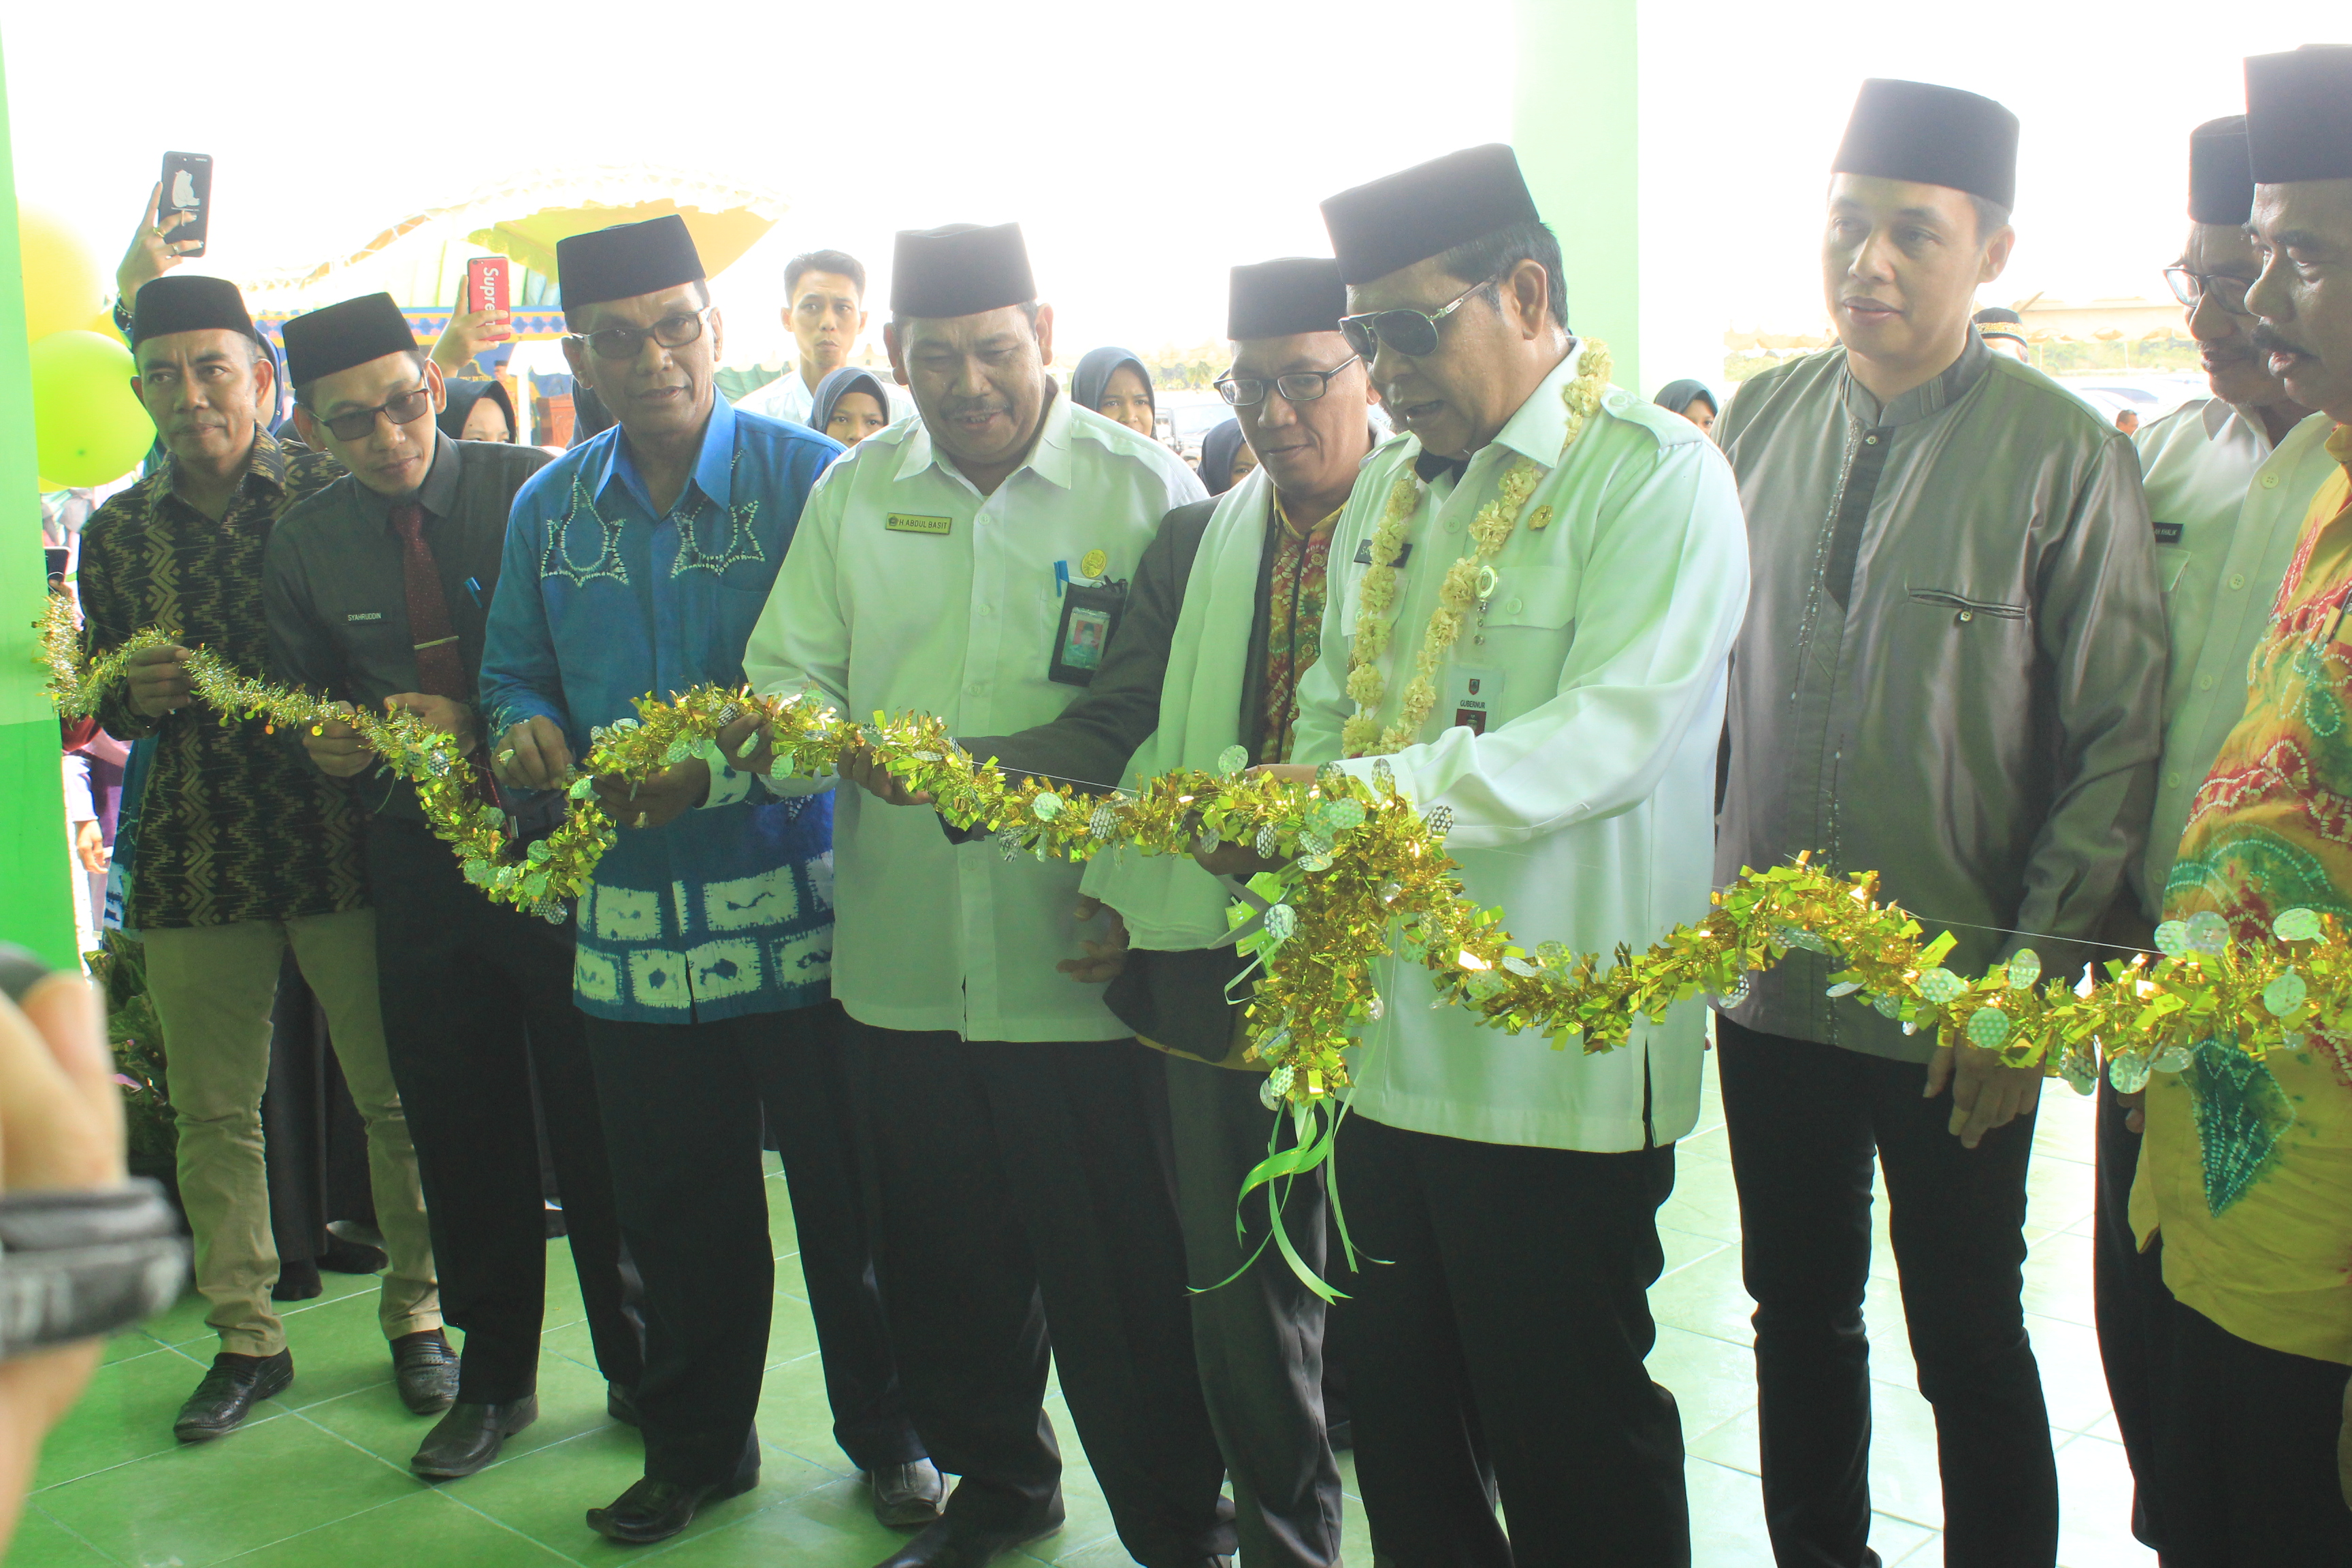 Gubernur Kalimantan Selatan H. Sahbirin Noor Resmikan Gedung Baru Ponpes Azzikra DDI